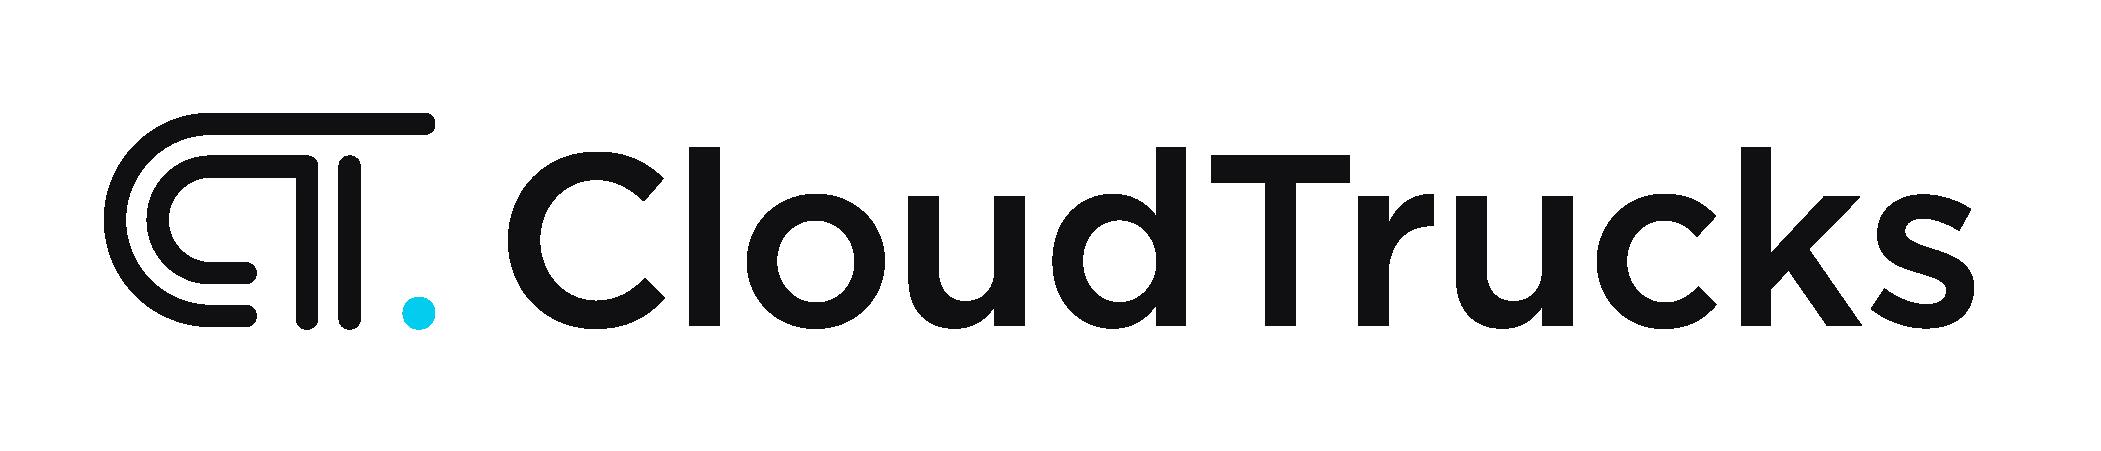 CloudTrucks logo